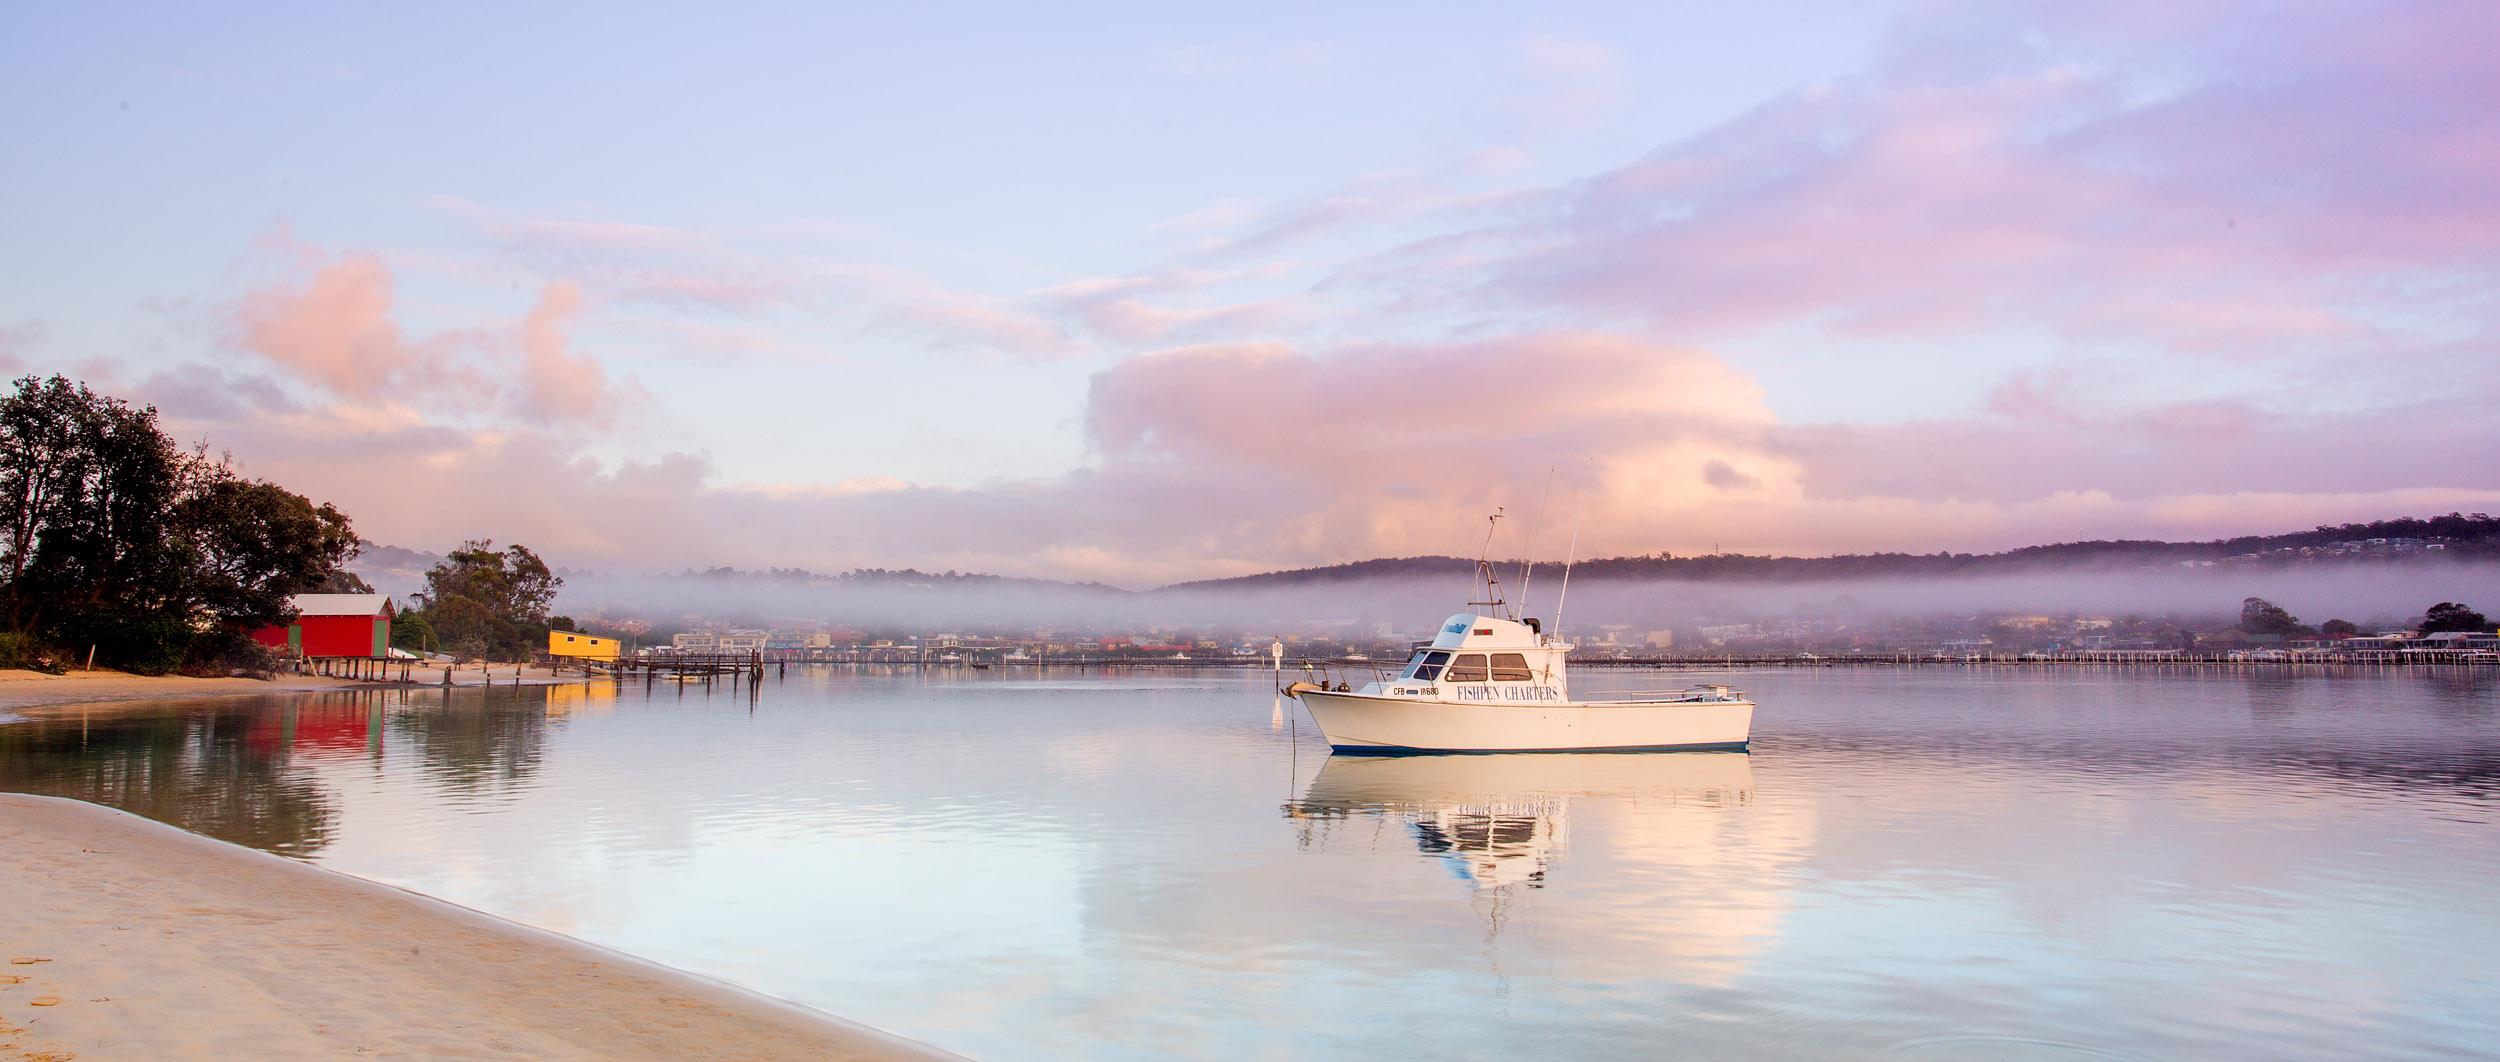 merimbula-boat-harbour-south-coast-nsw- .jpg